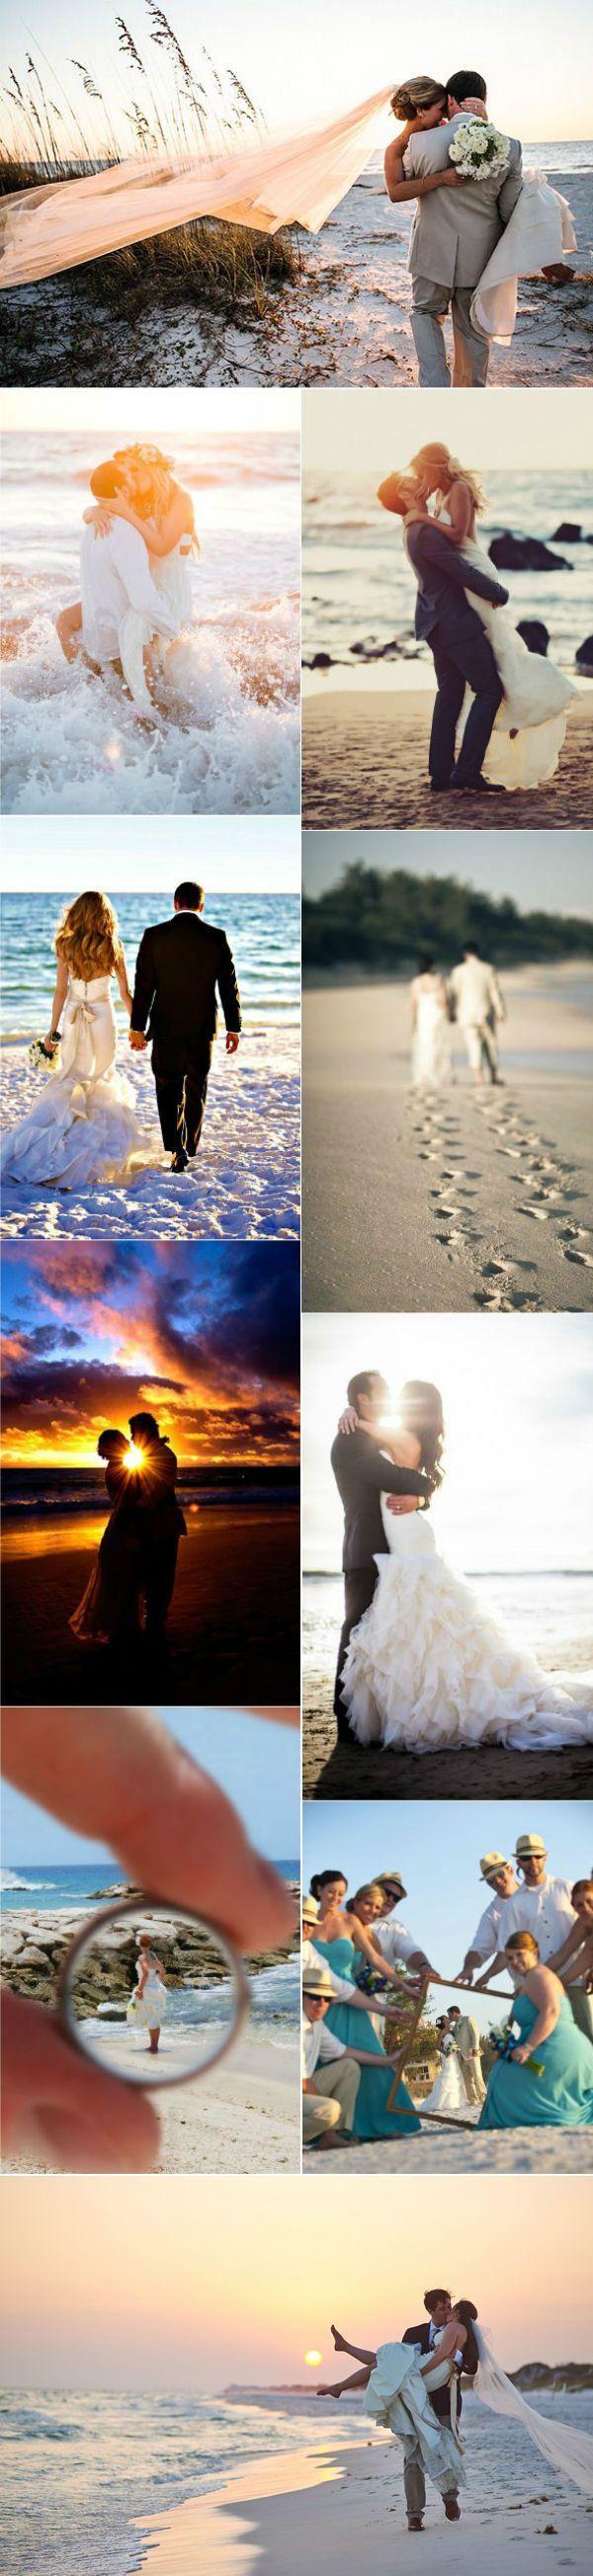 destination wedding ideas 10 best photos - destination wedding  - cuteweddingideas.com